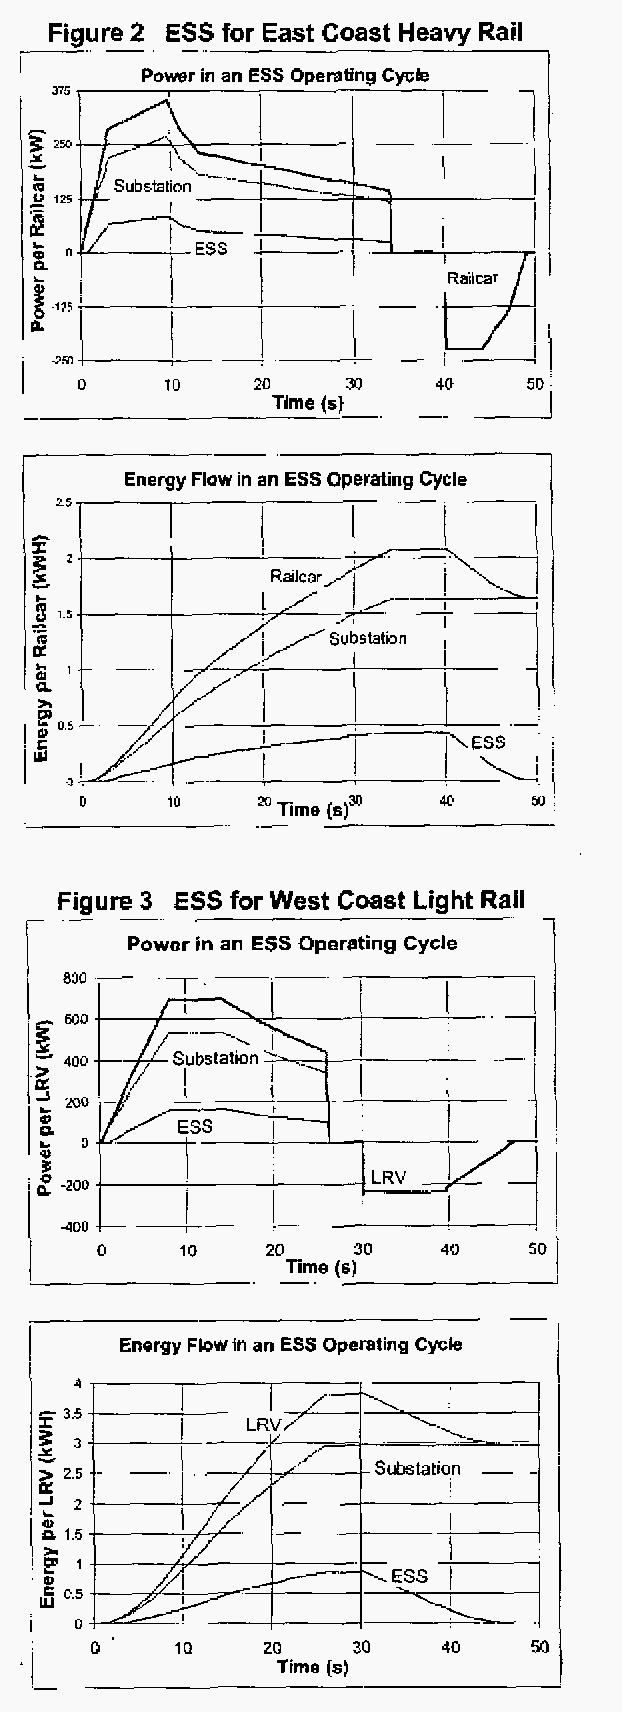 Figure 2 ESS for East Coast Heavy Rail